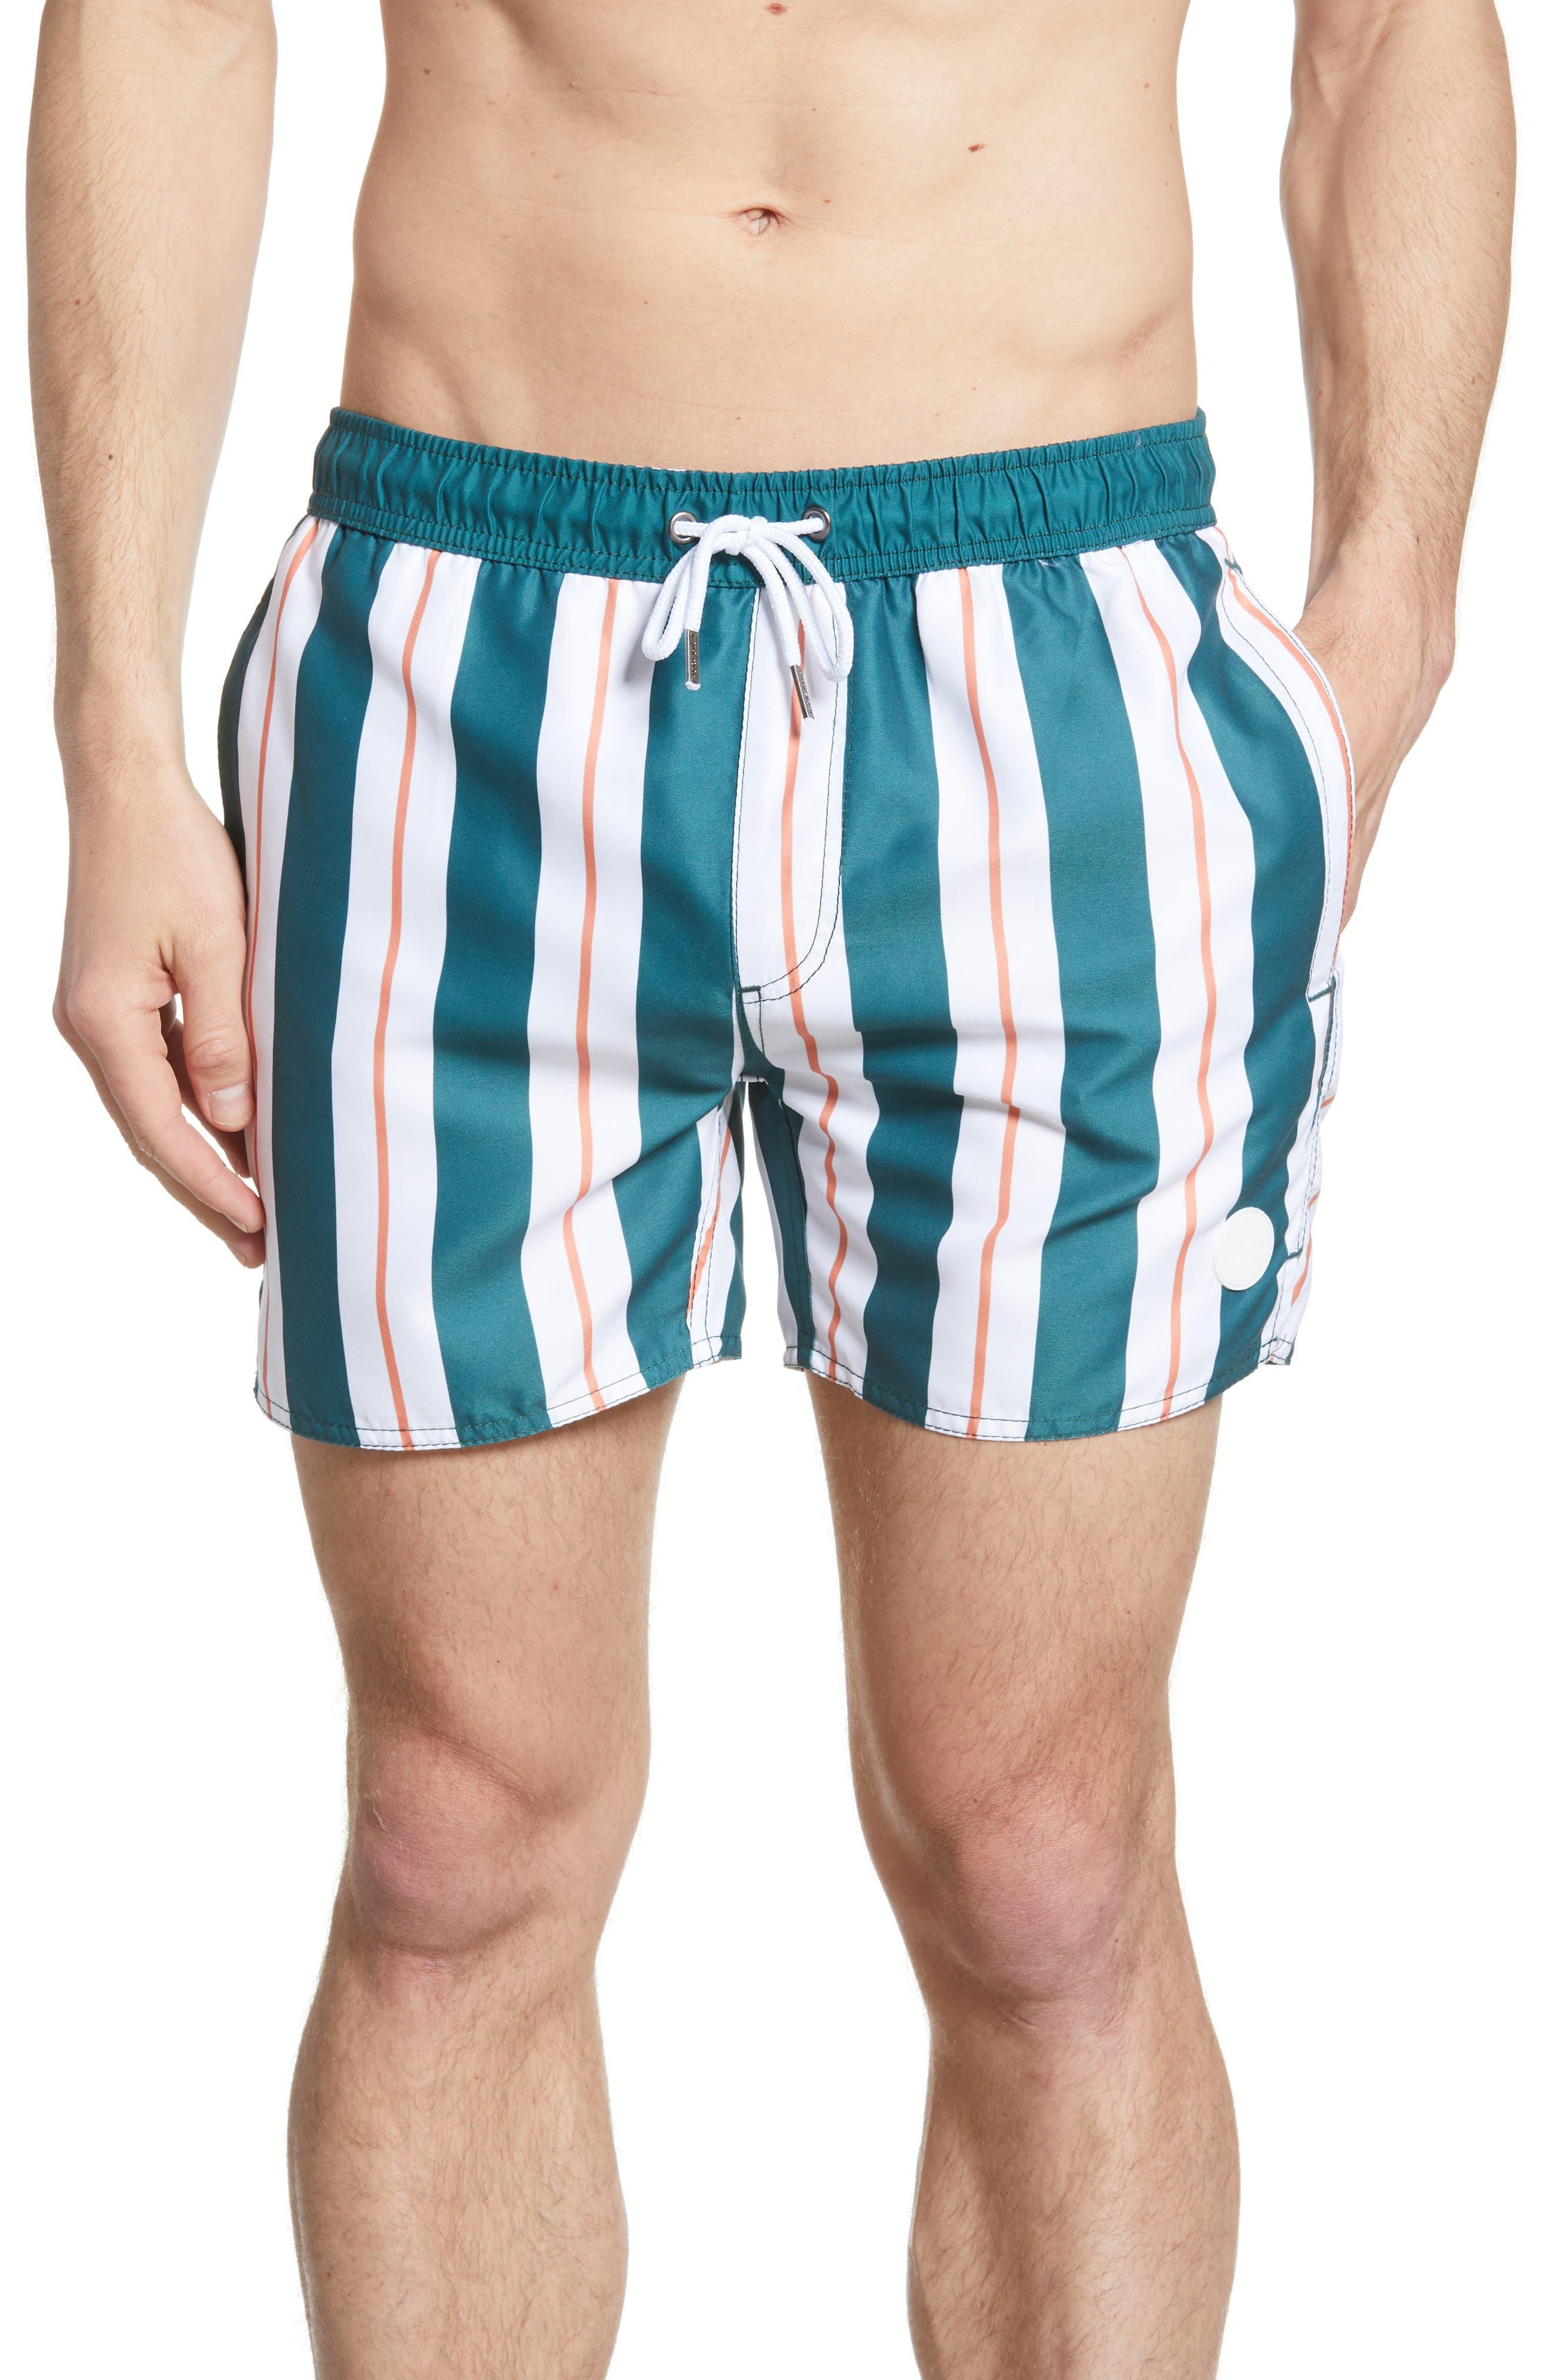 Rhythm Vertical Stripe Print Swim Trunks, Green